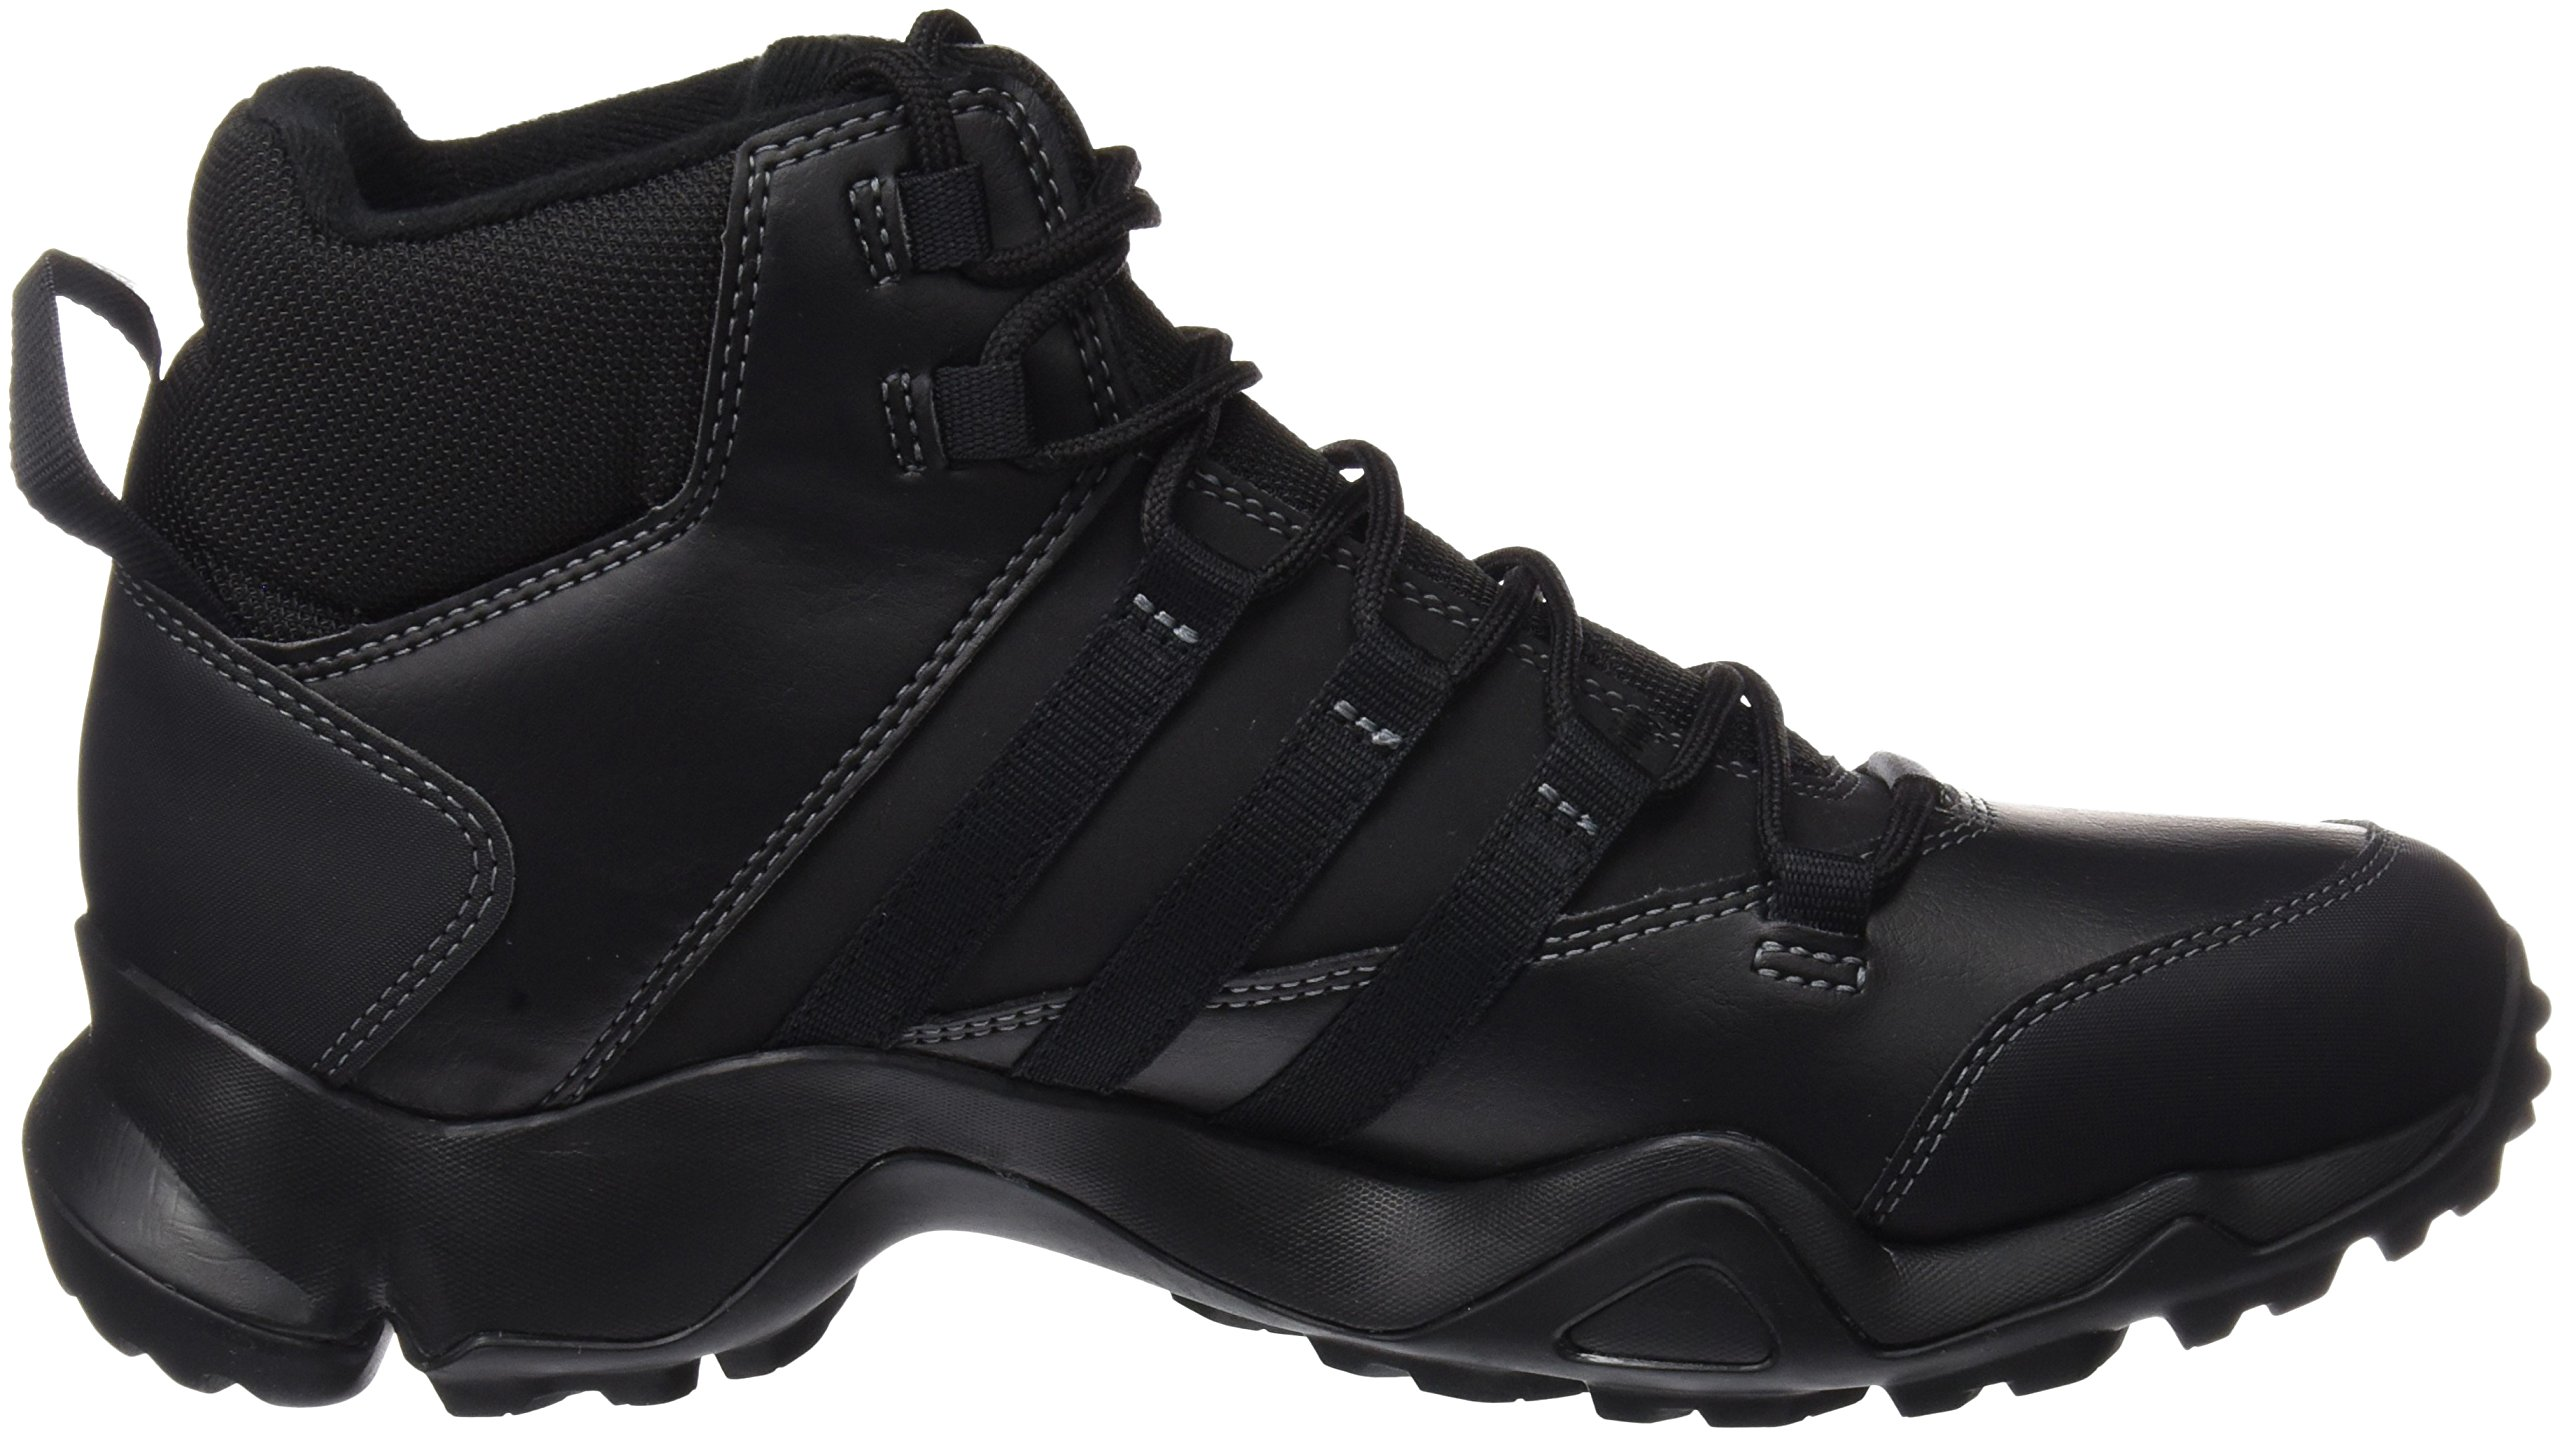 81sL8dFhI6L - adidas Men's Terrex Ax2r Beta Mid Cw High Rise Hiking Boots